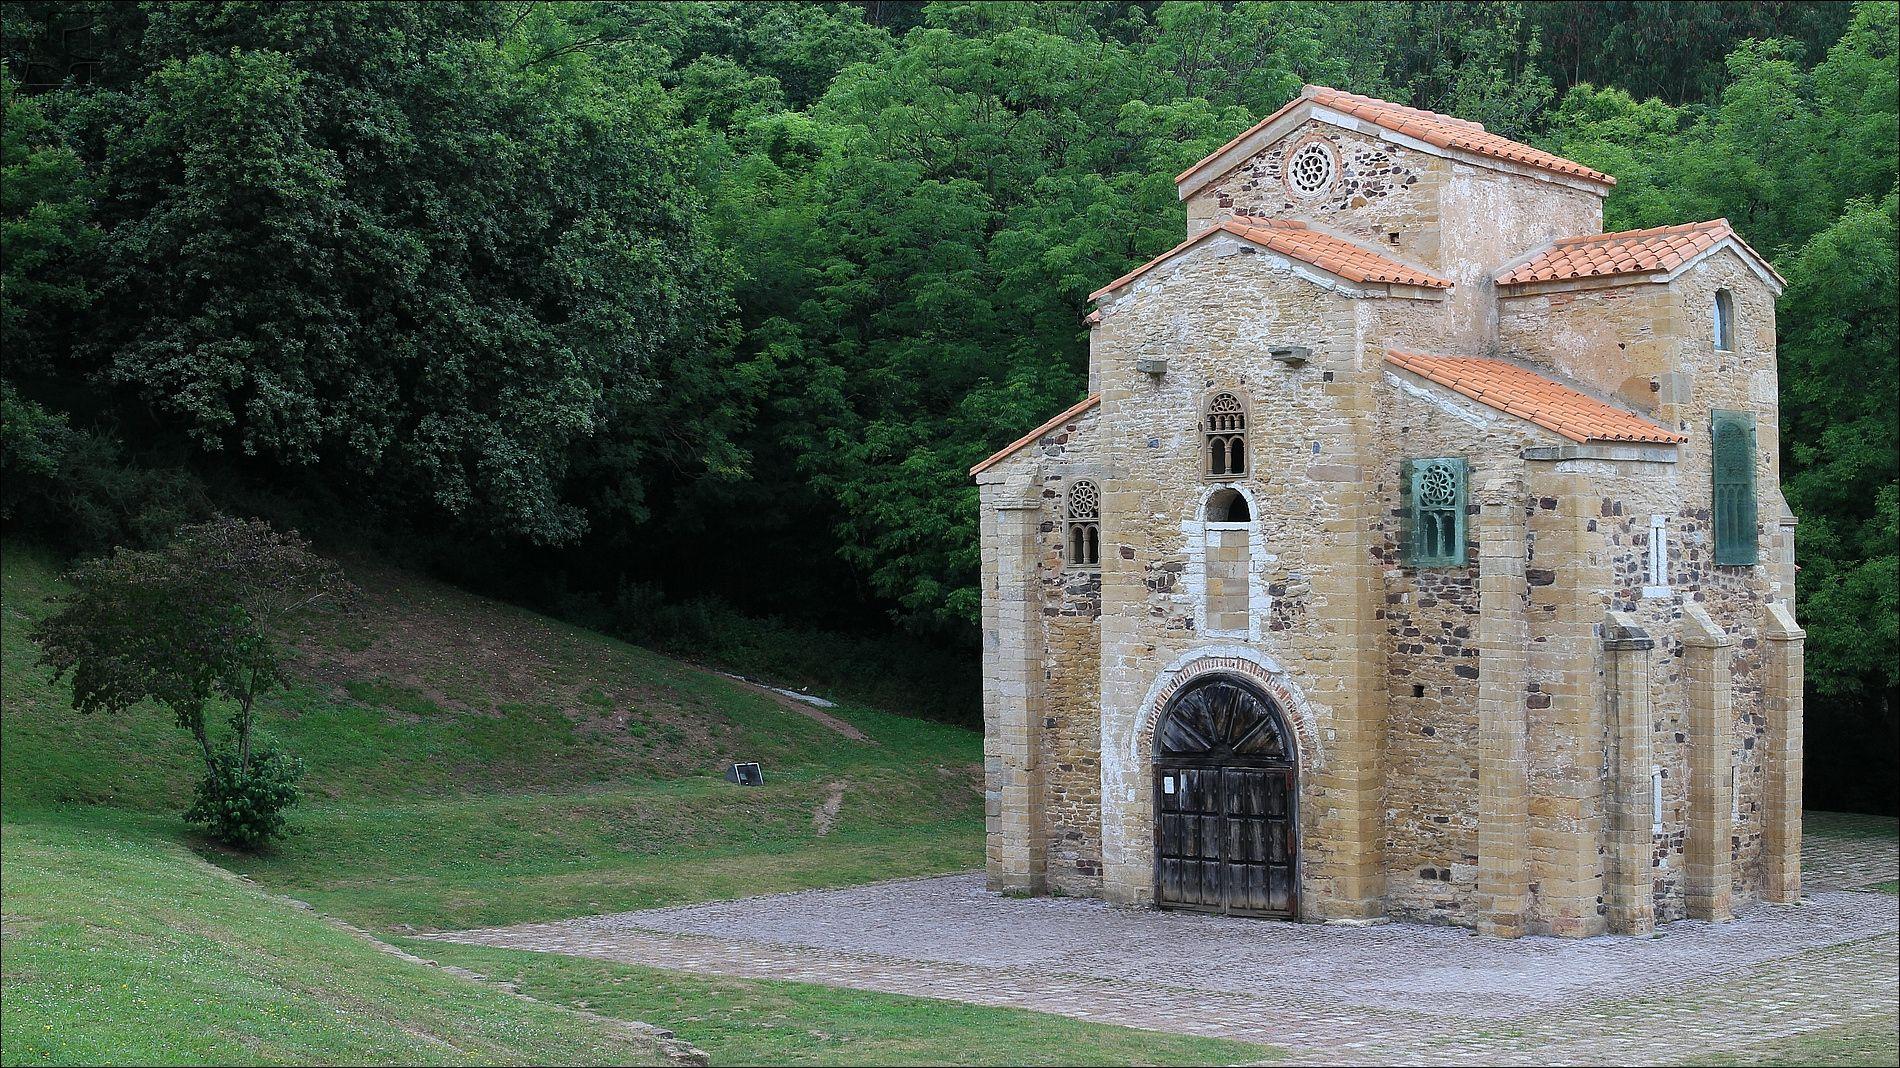 San Miguel de Lillo - San Miguel de Lillo Roman Catholic church (848) - UNESCO World Heritage Site since 1985 - Oviedo - Asturias - Spain